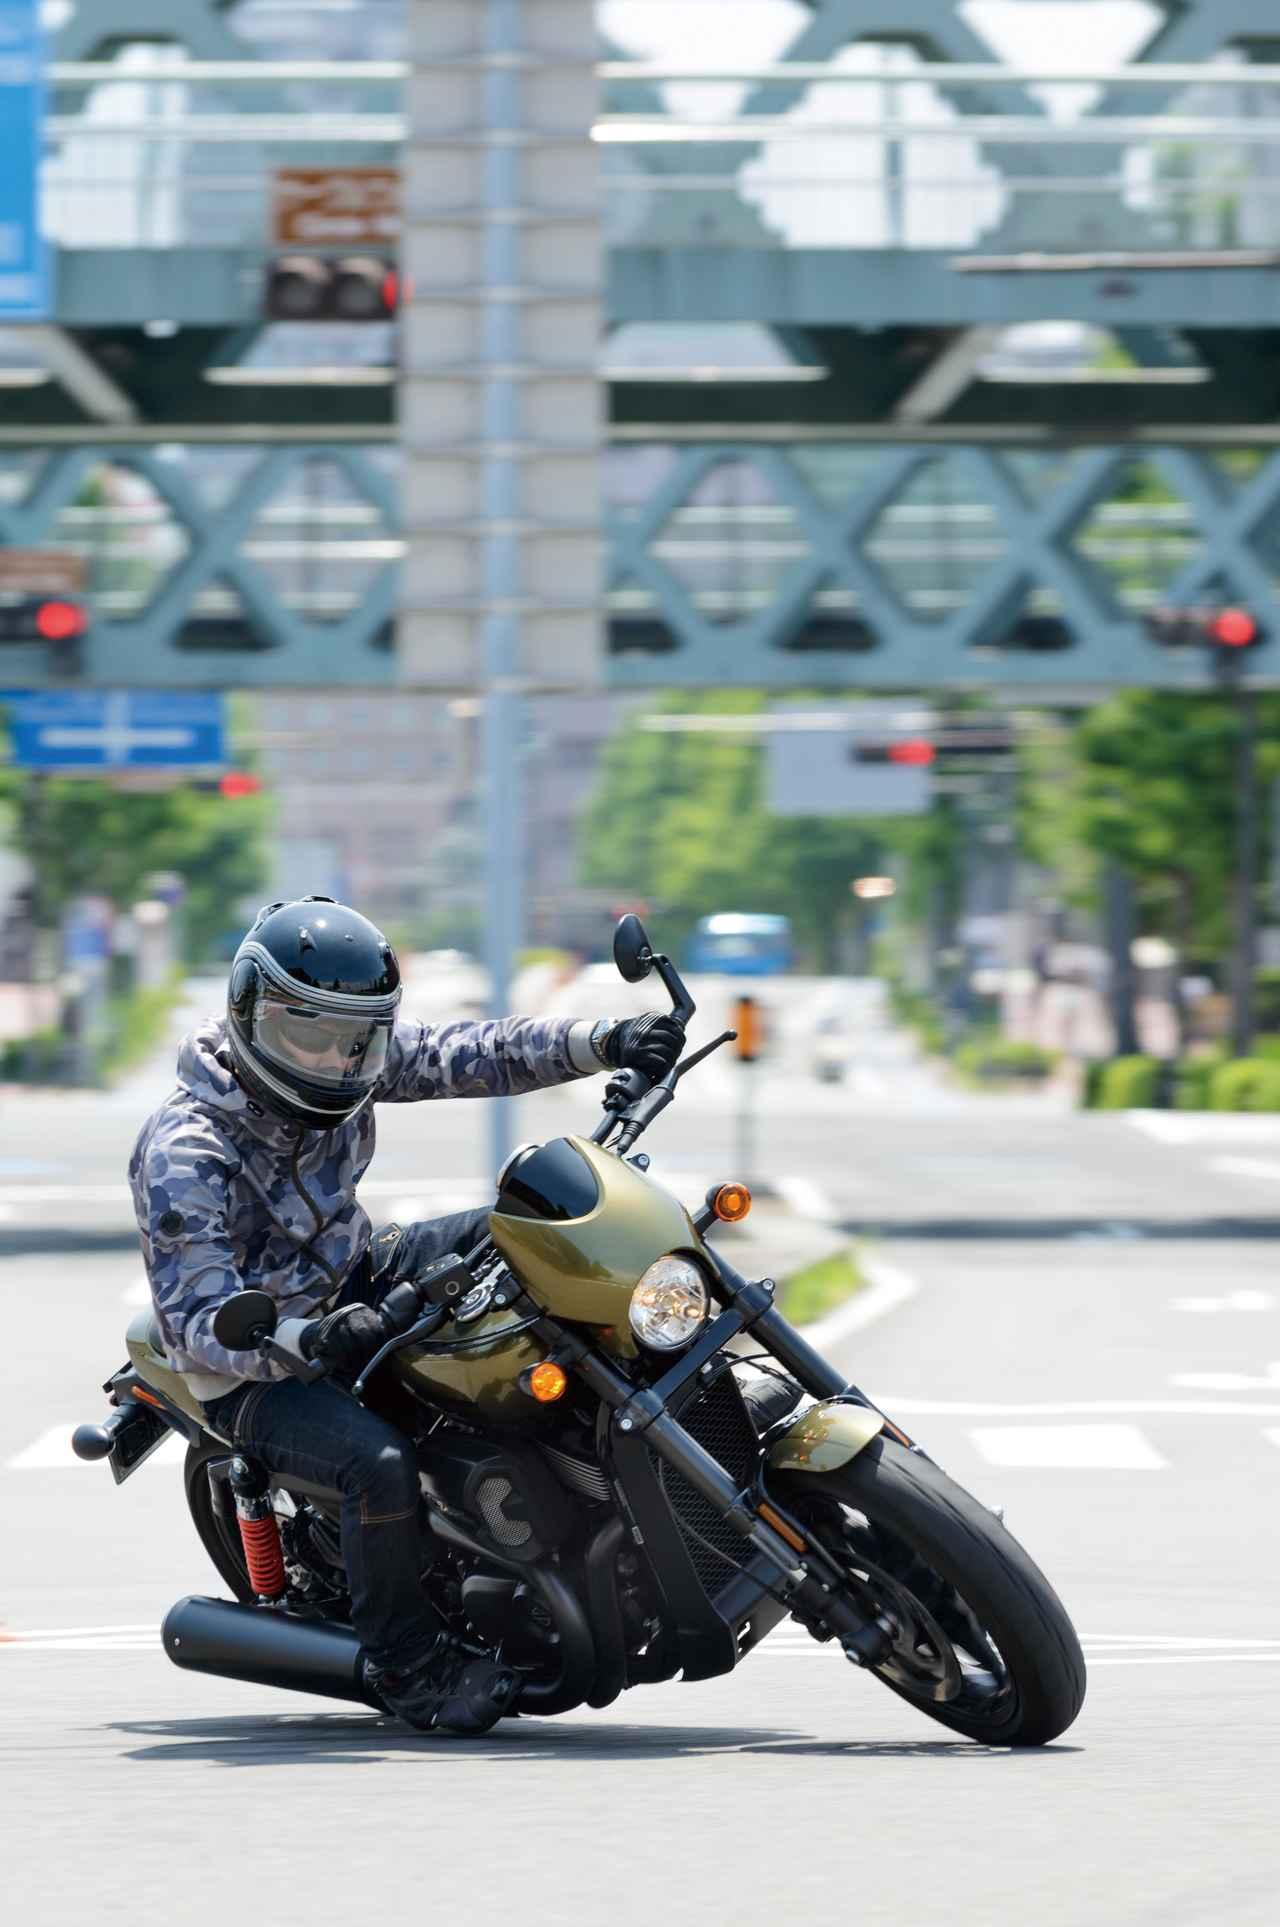 Images : 7番目の画像 - HARLEY-DAVIDSON STREET ROD[XG750A] - webオートバイ